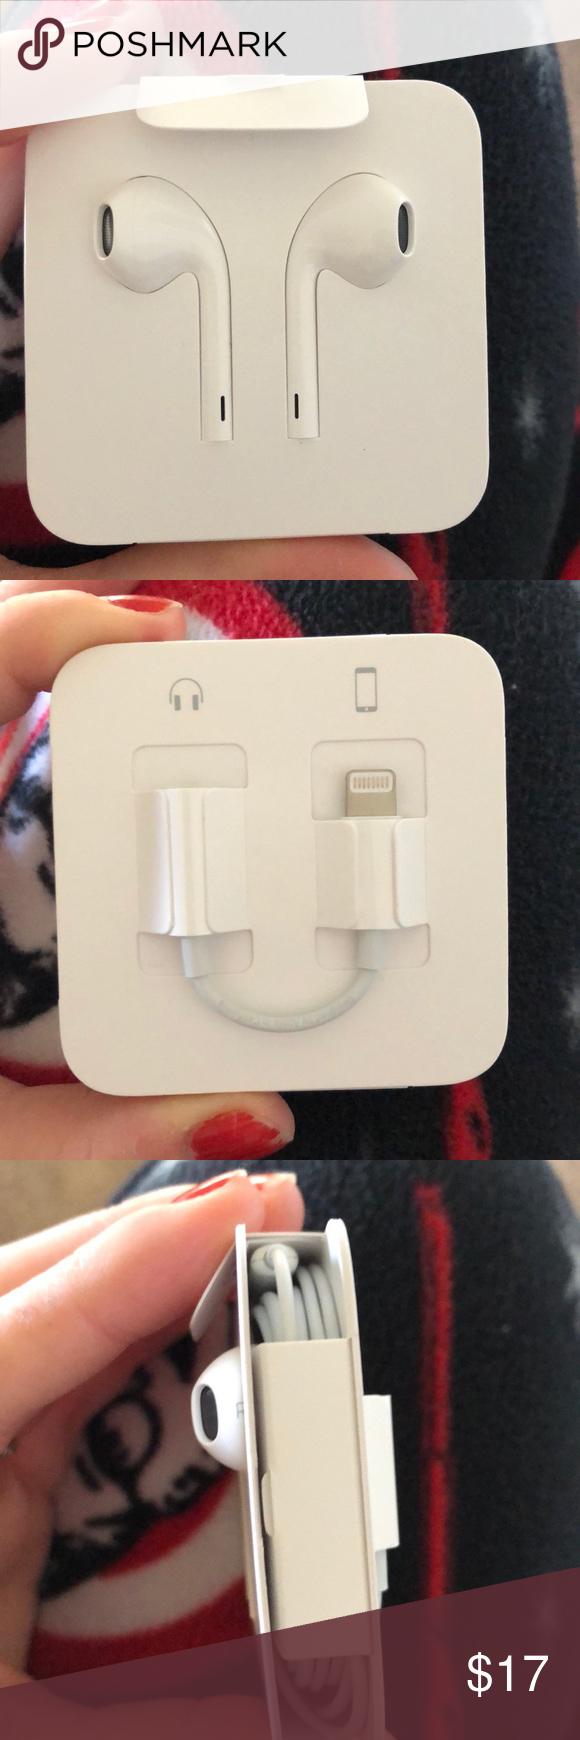 Apple Headphones With Dongle Apple Headphone Headphones Apple